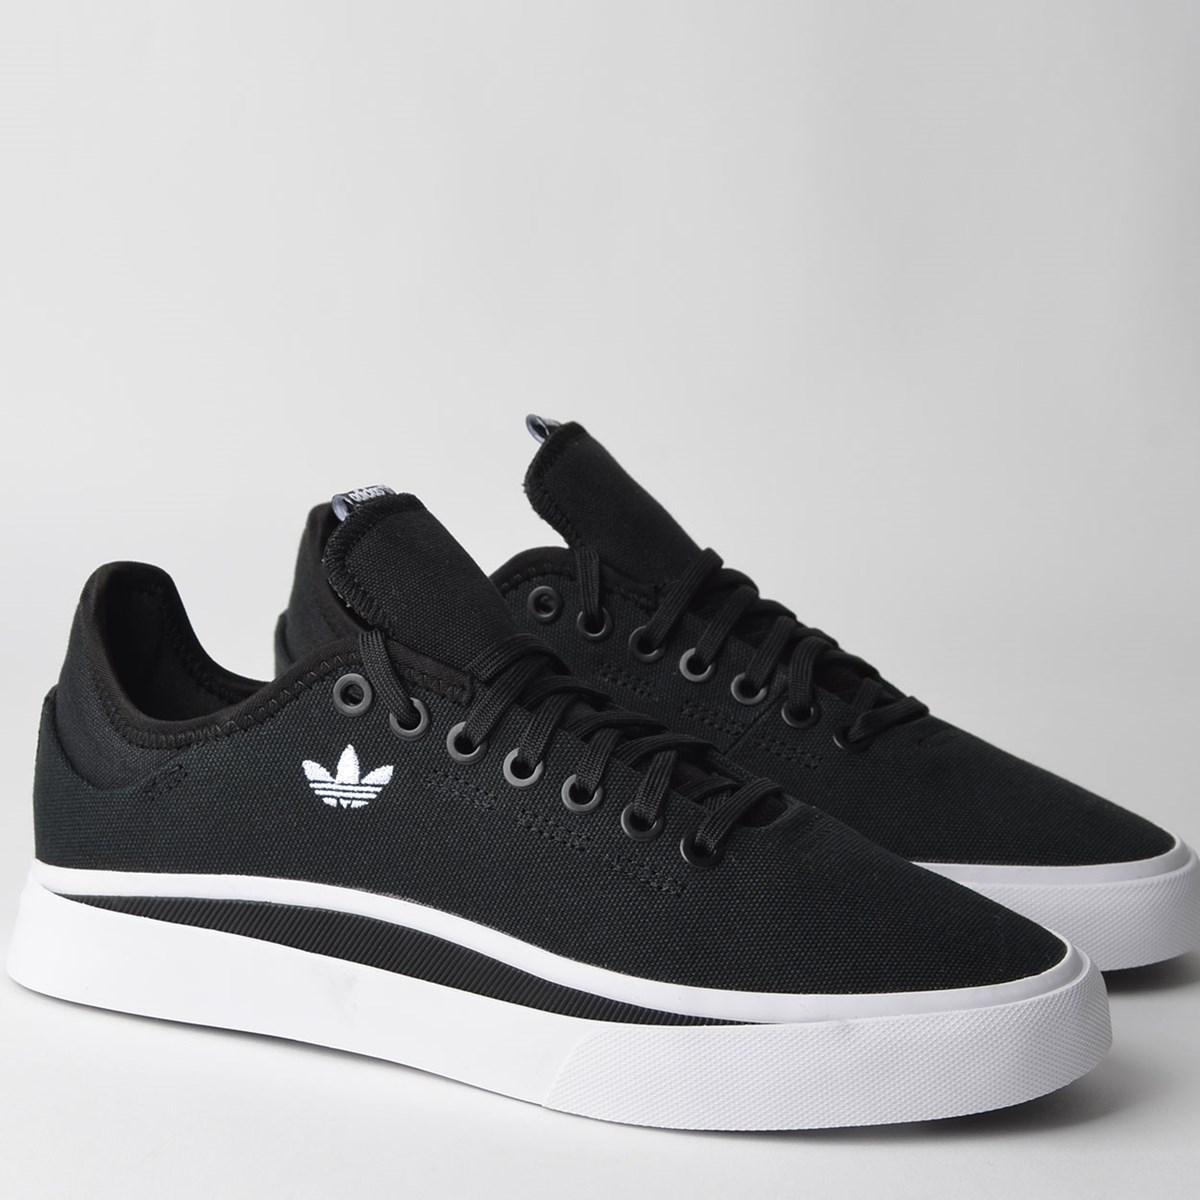 Tênis Adidas Sabalo Preto Branco EE6122